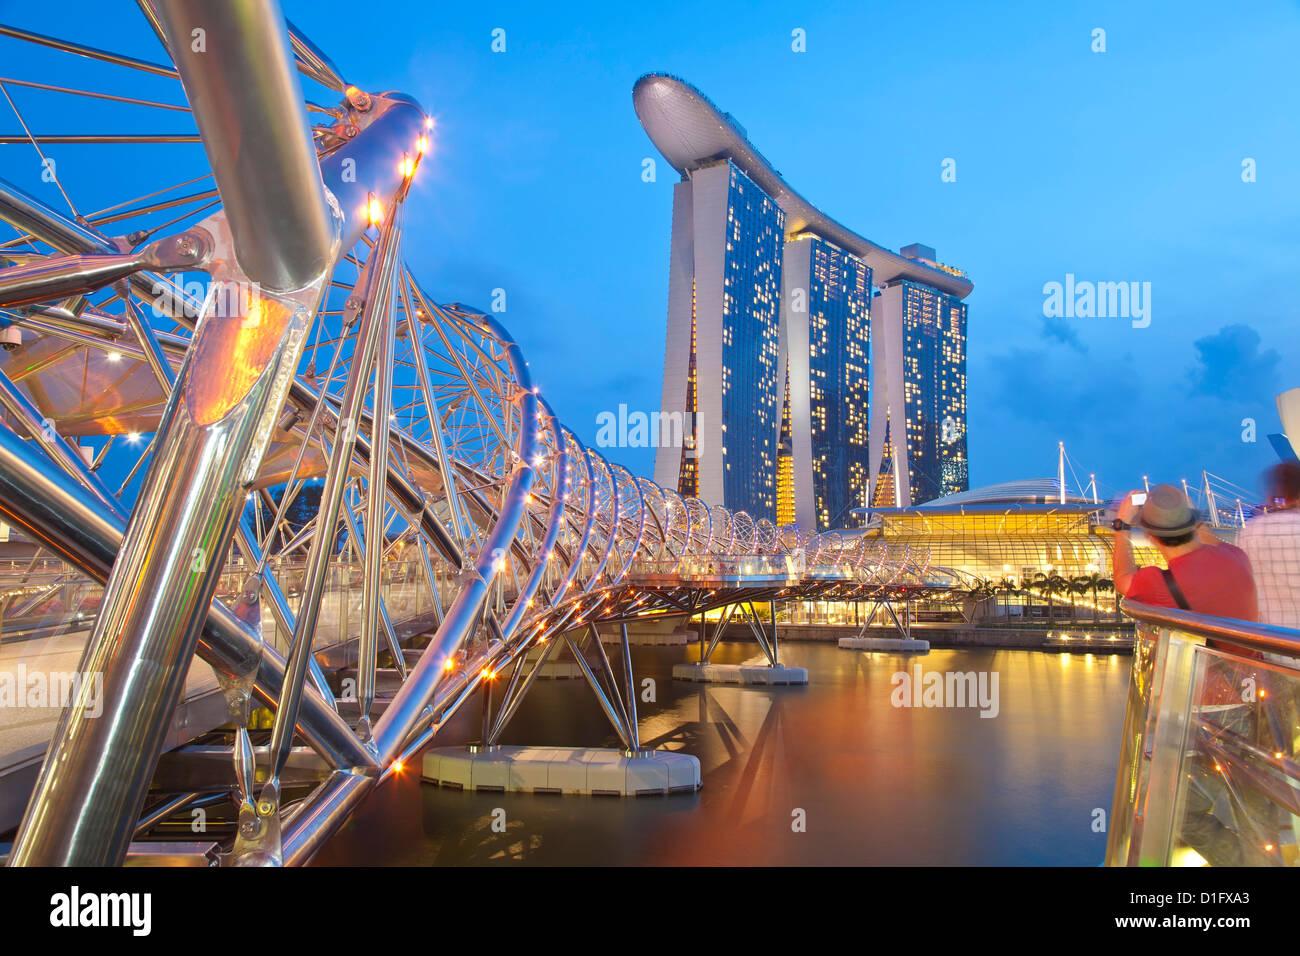 The Helix Bridge and Marina Bay Sands, Marina Bay, Singapore, Southeast Asia, Asia - Stock Image